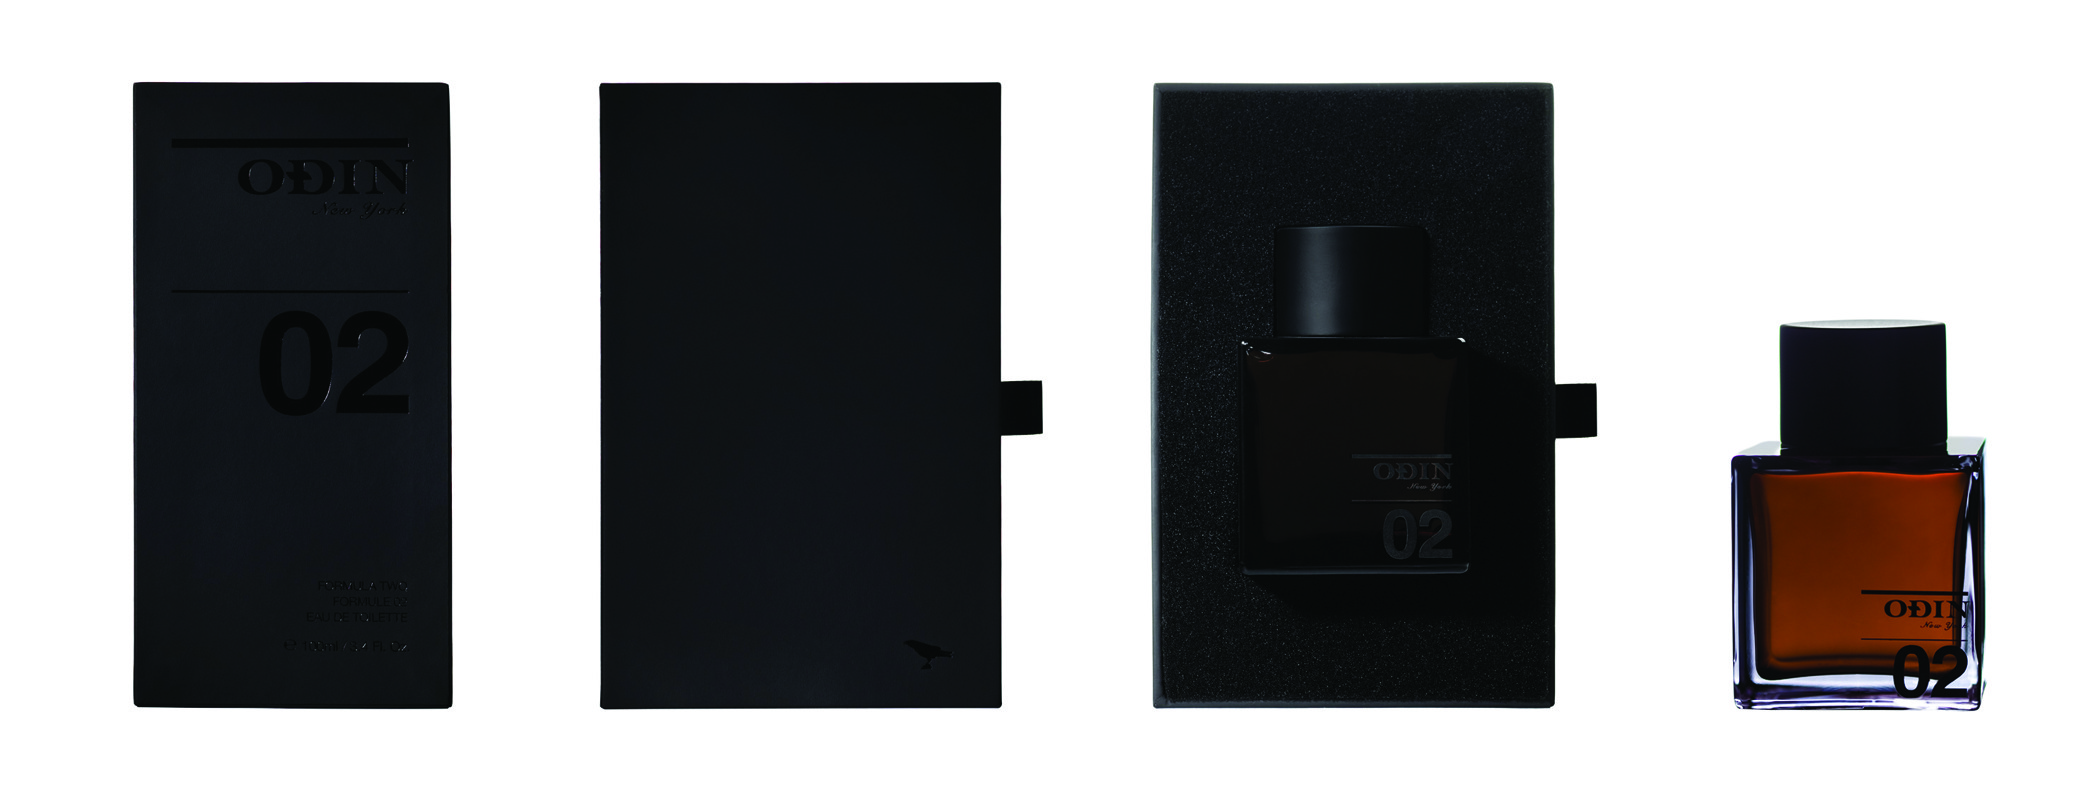 Odin New York 02 Owari аромат для мужчин и женщин